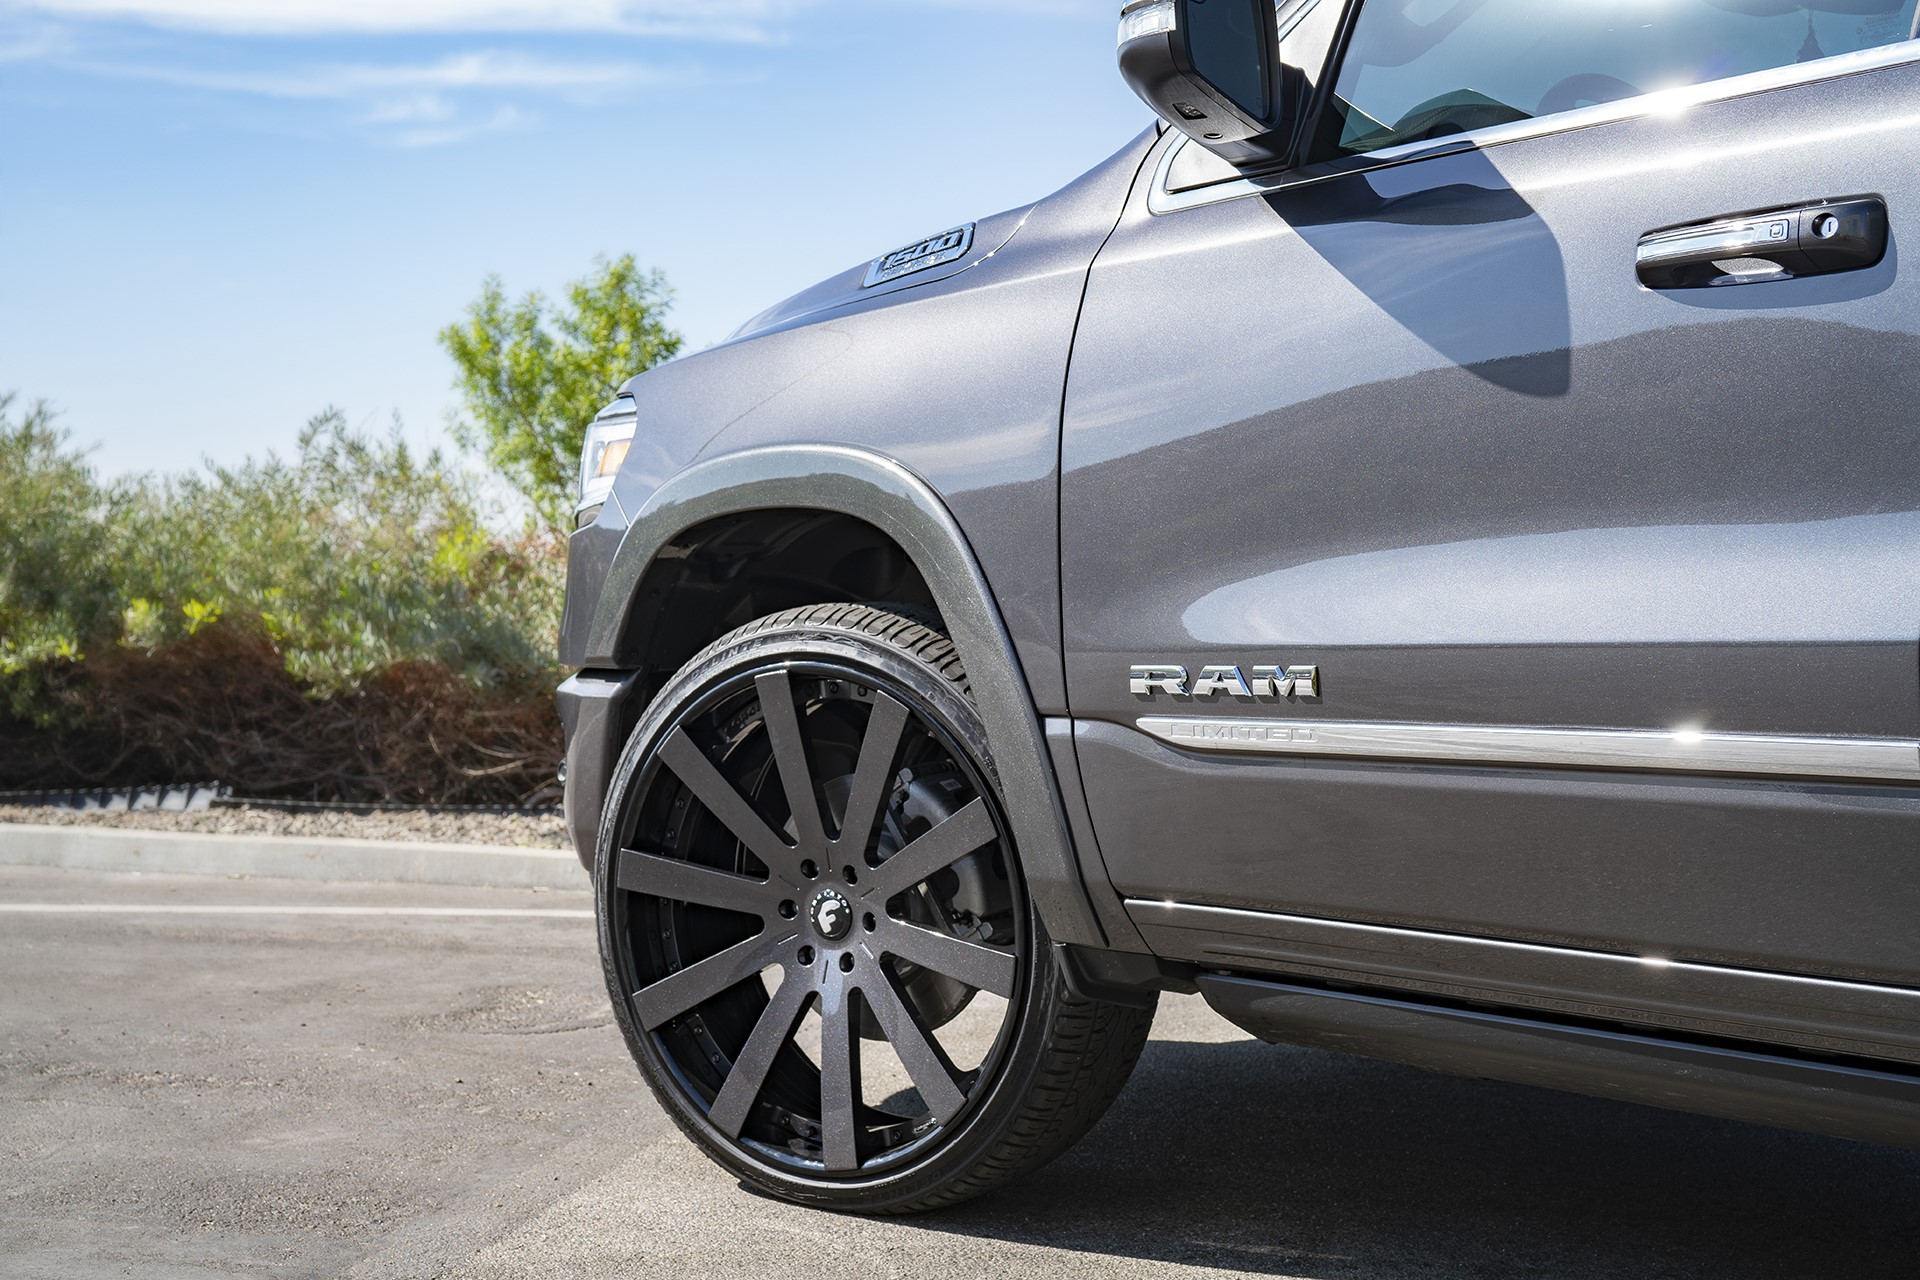 Ram 1500 Shaquille O Neal Forgiato wheels (6)